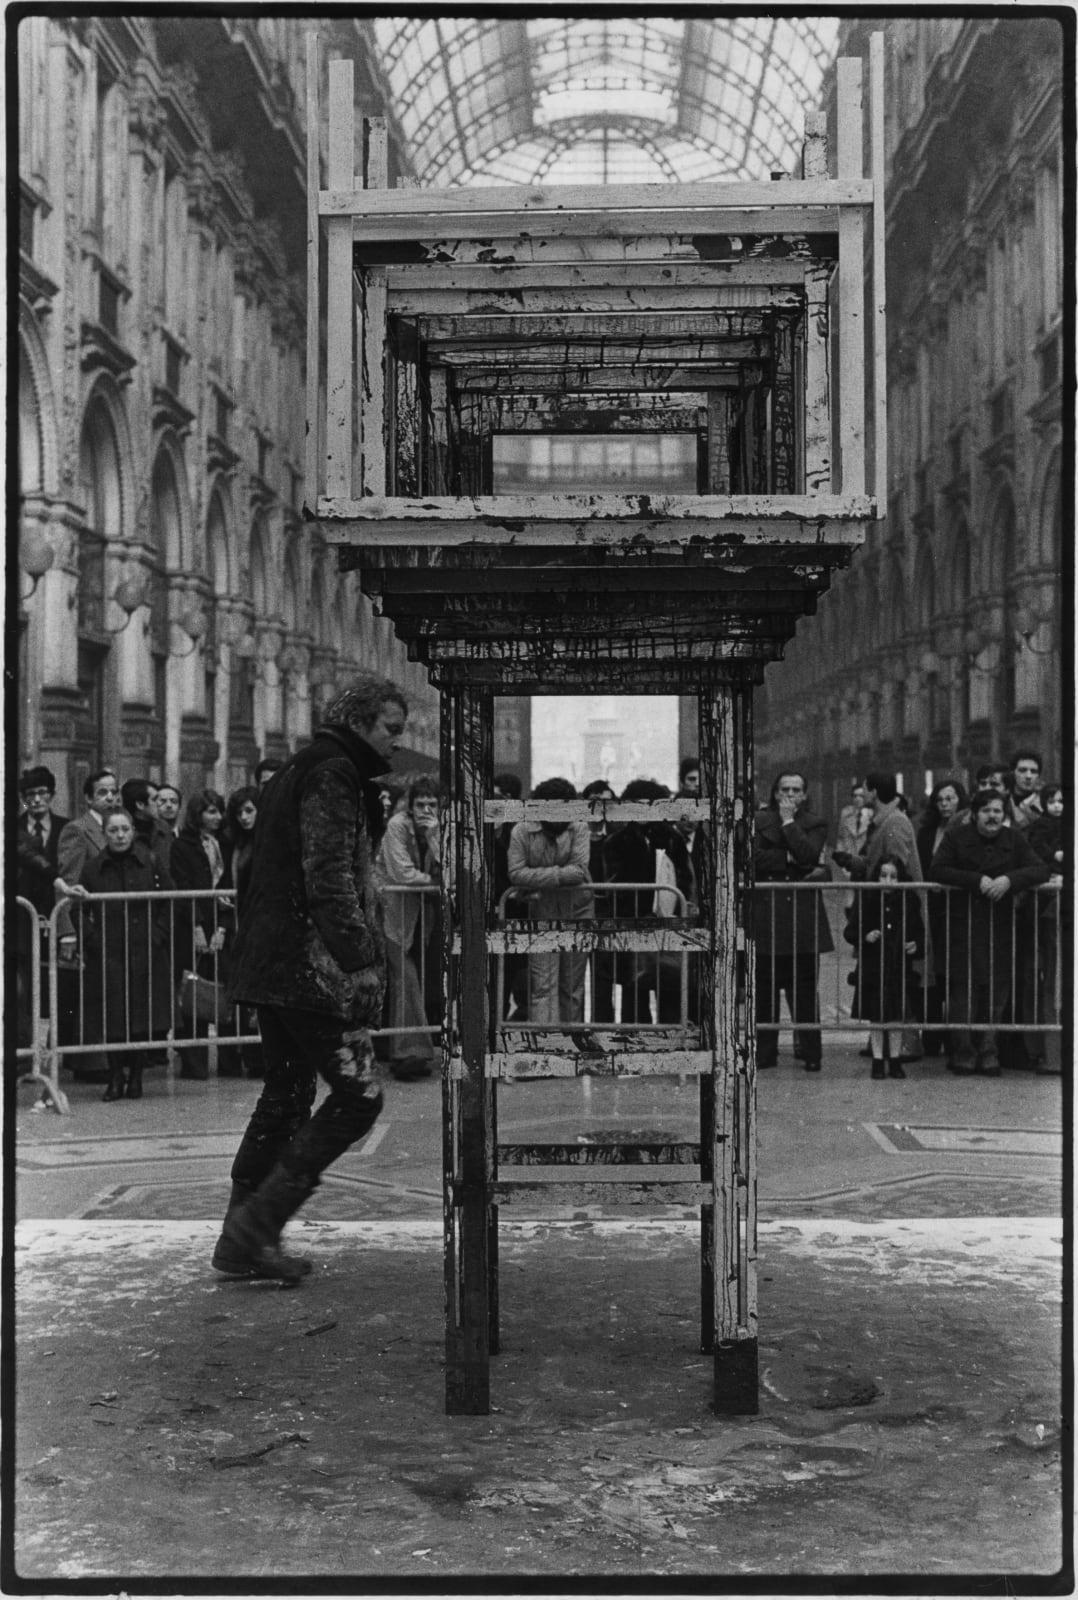 Stuart Brisley, Homage to the Commune, 1976 performance documentation